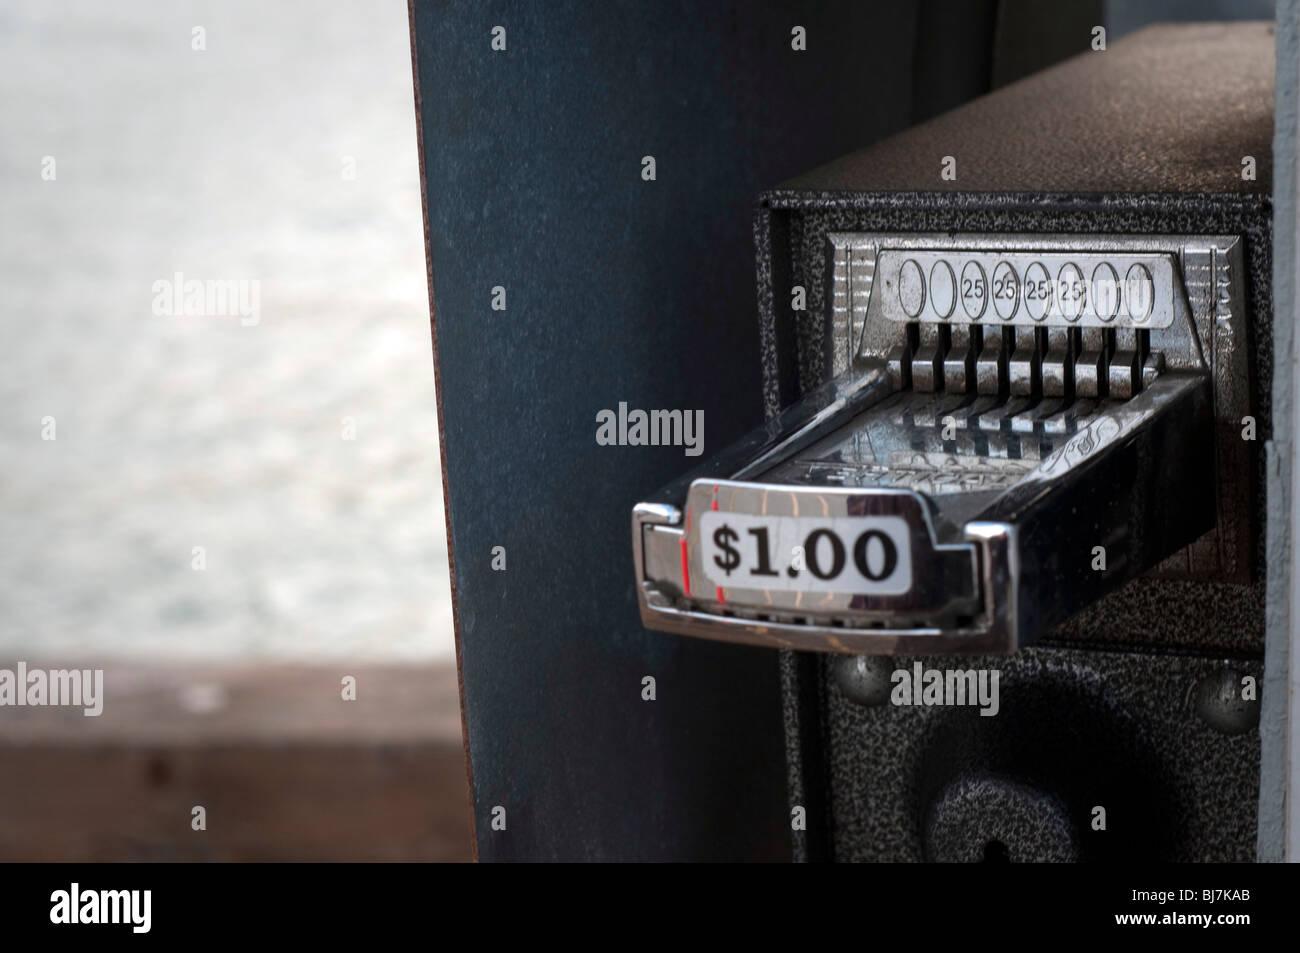 A quarter coin operating dispenser. - Stock Image